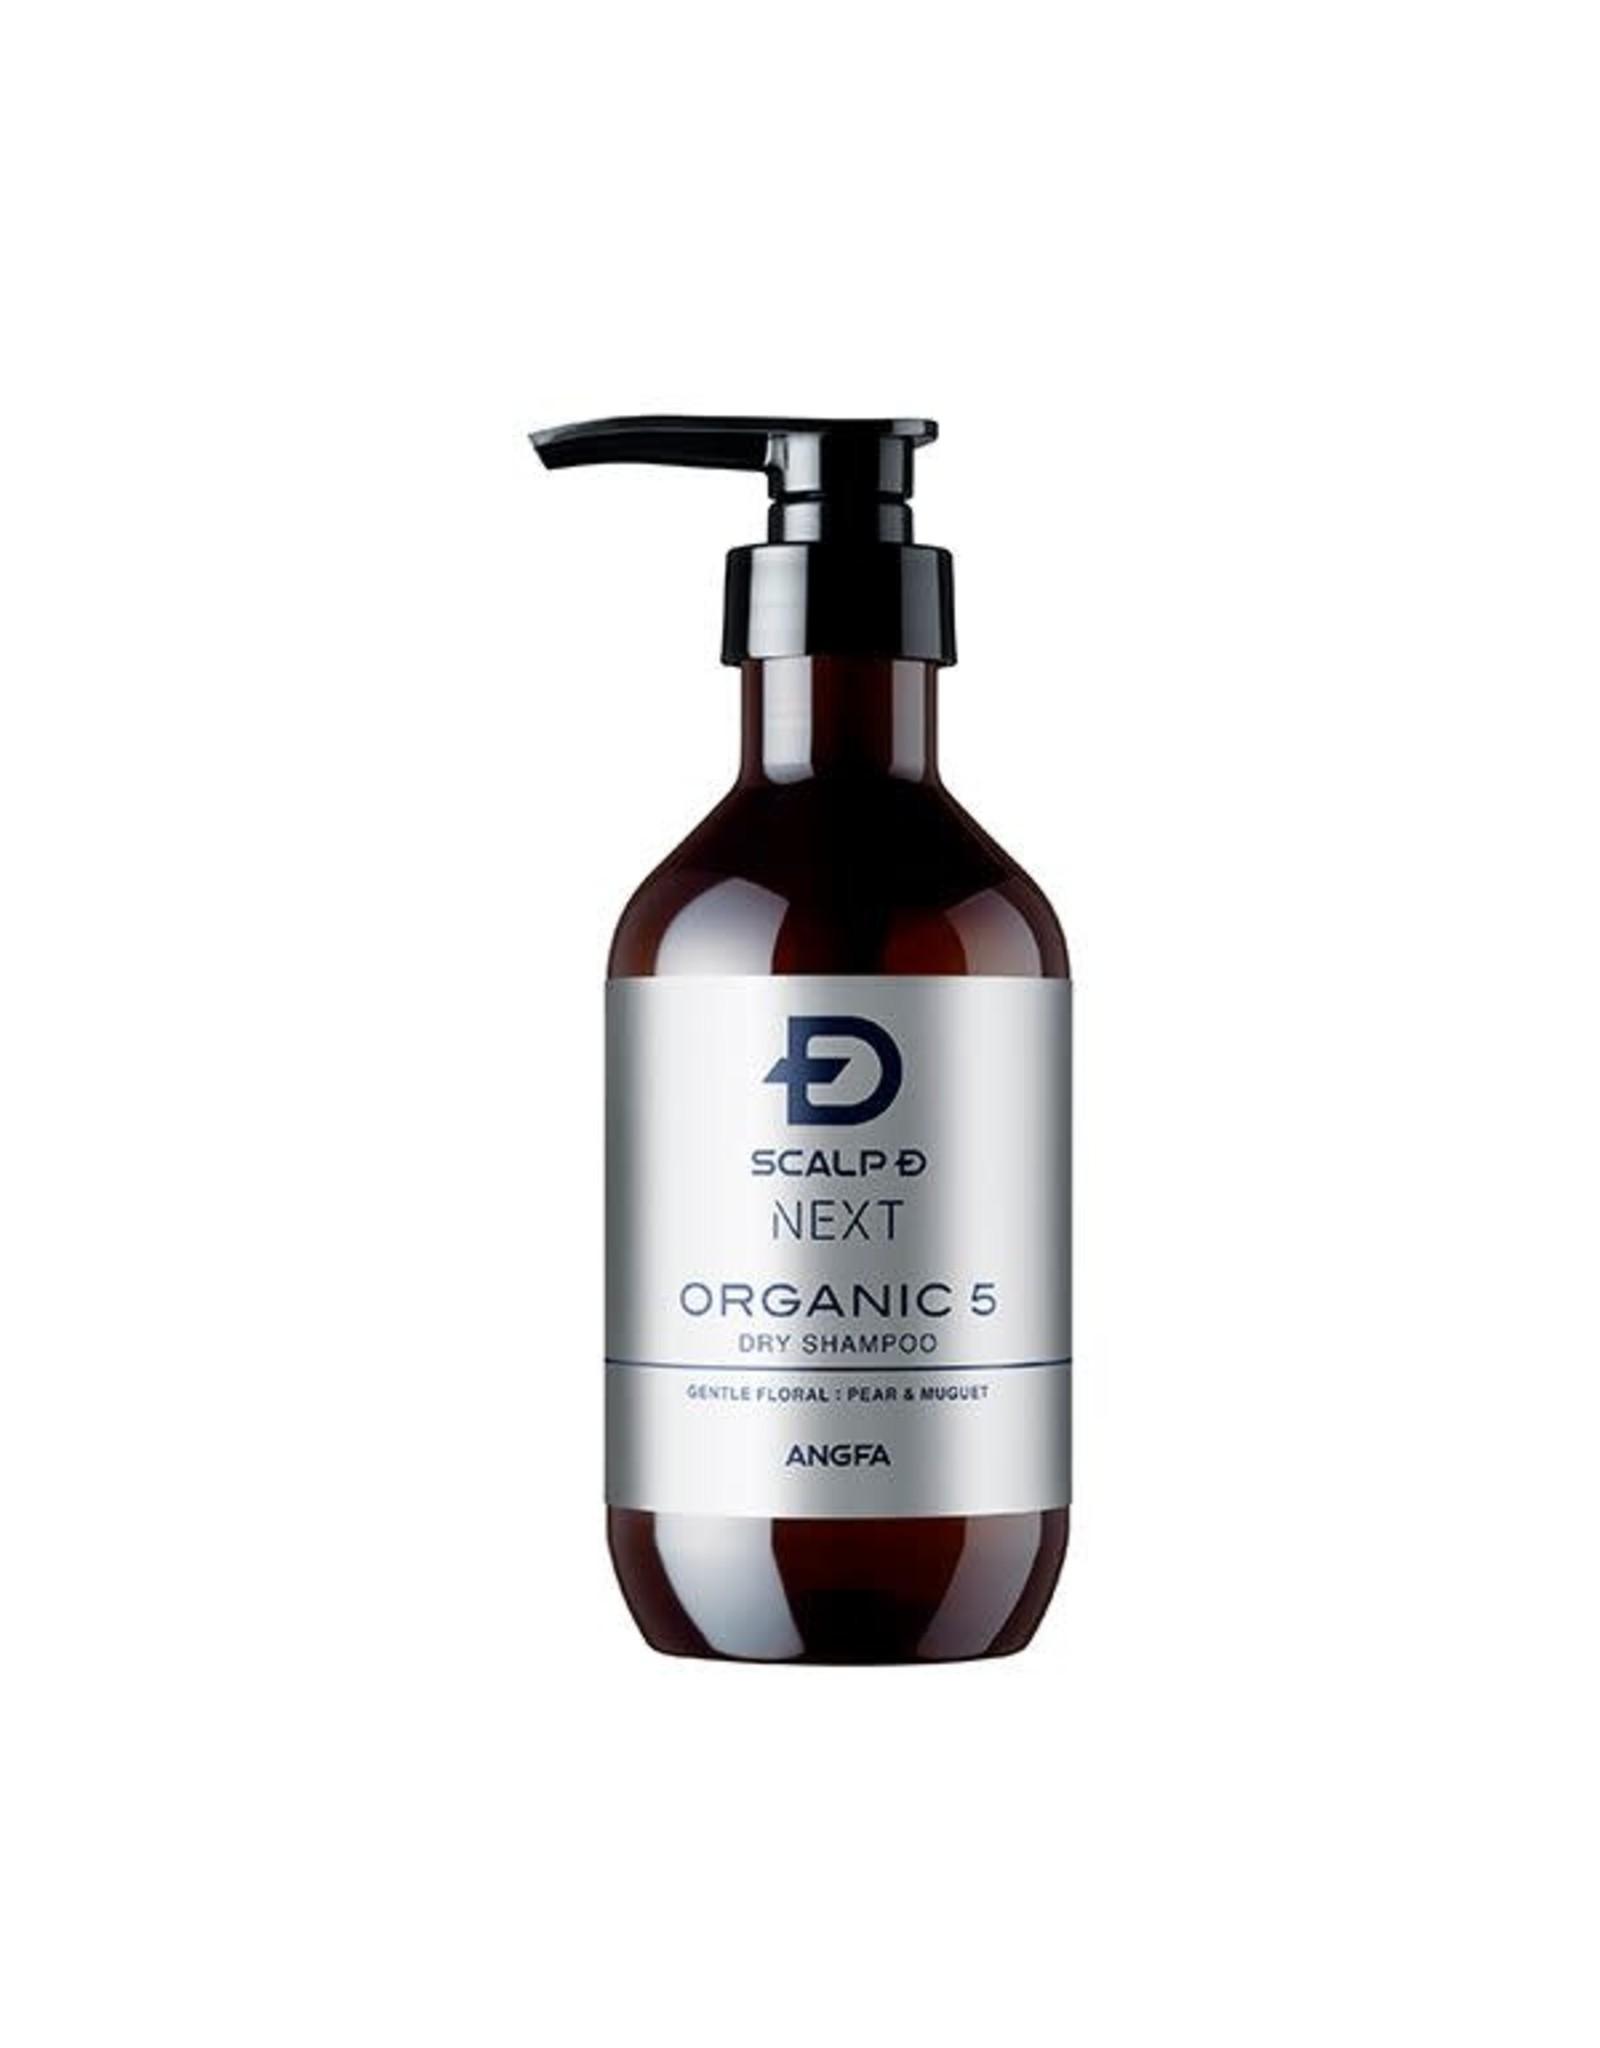 Angfa ANGFA Scalp D Next Organic 5 Shampoo Dry